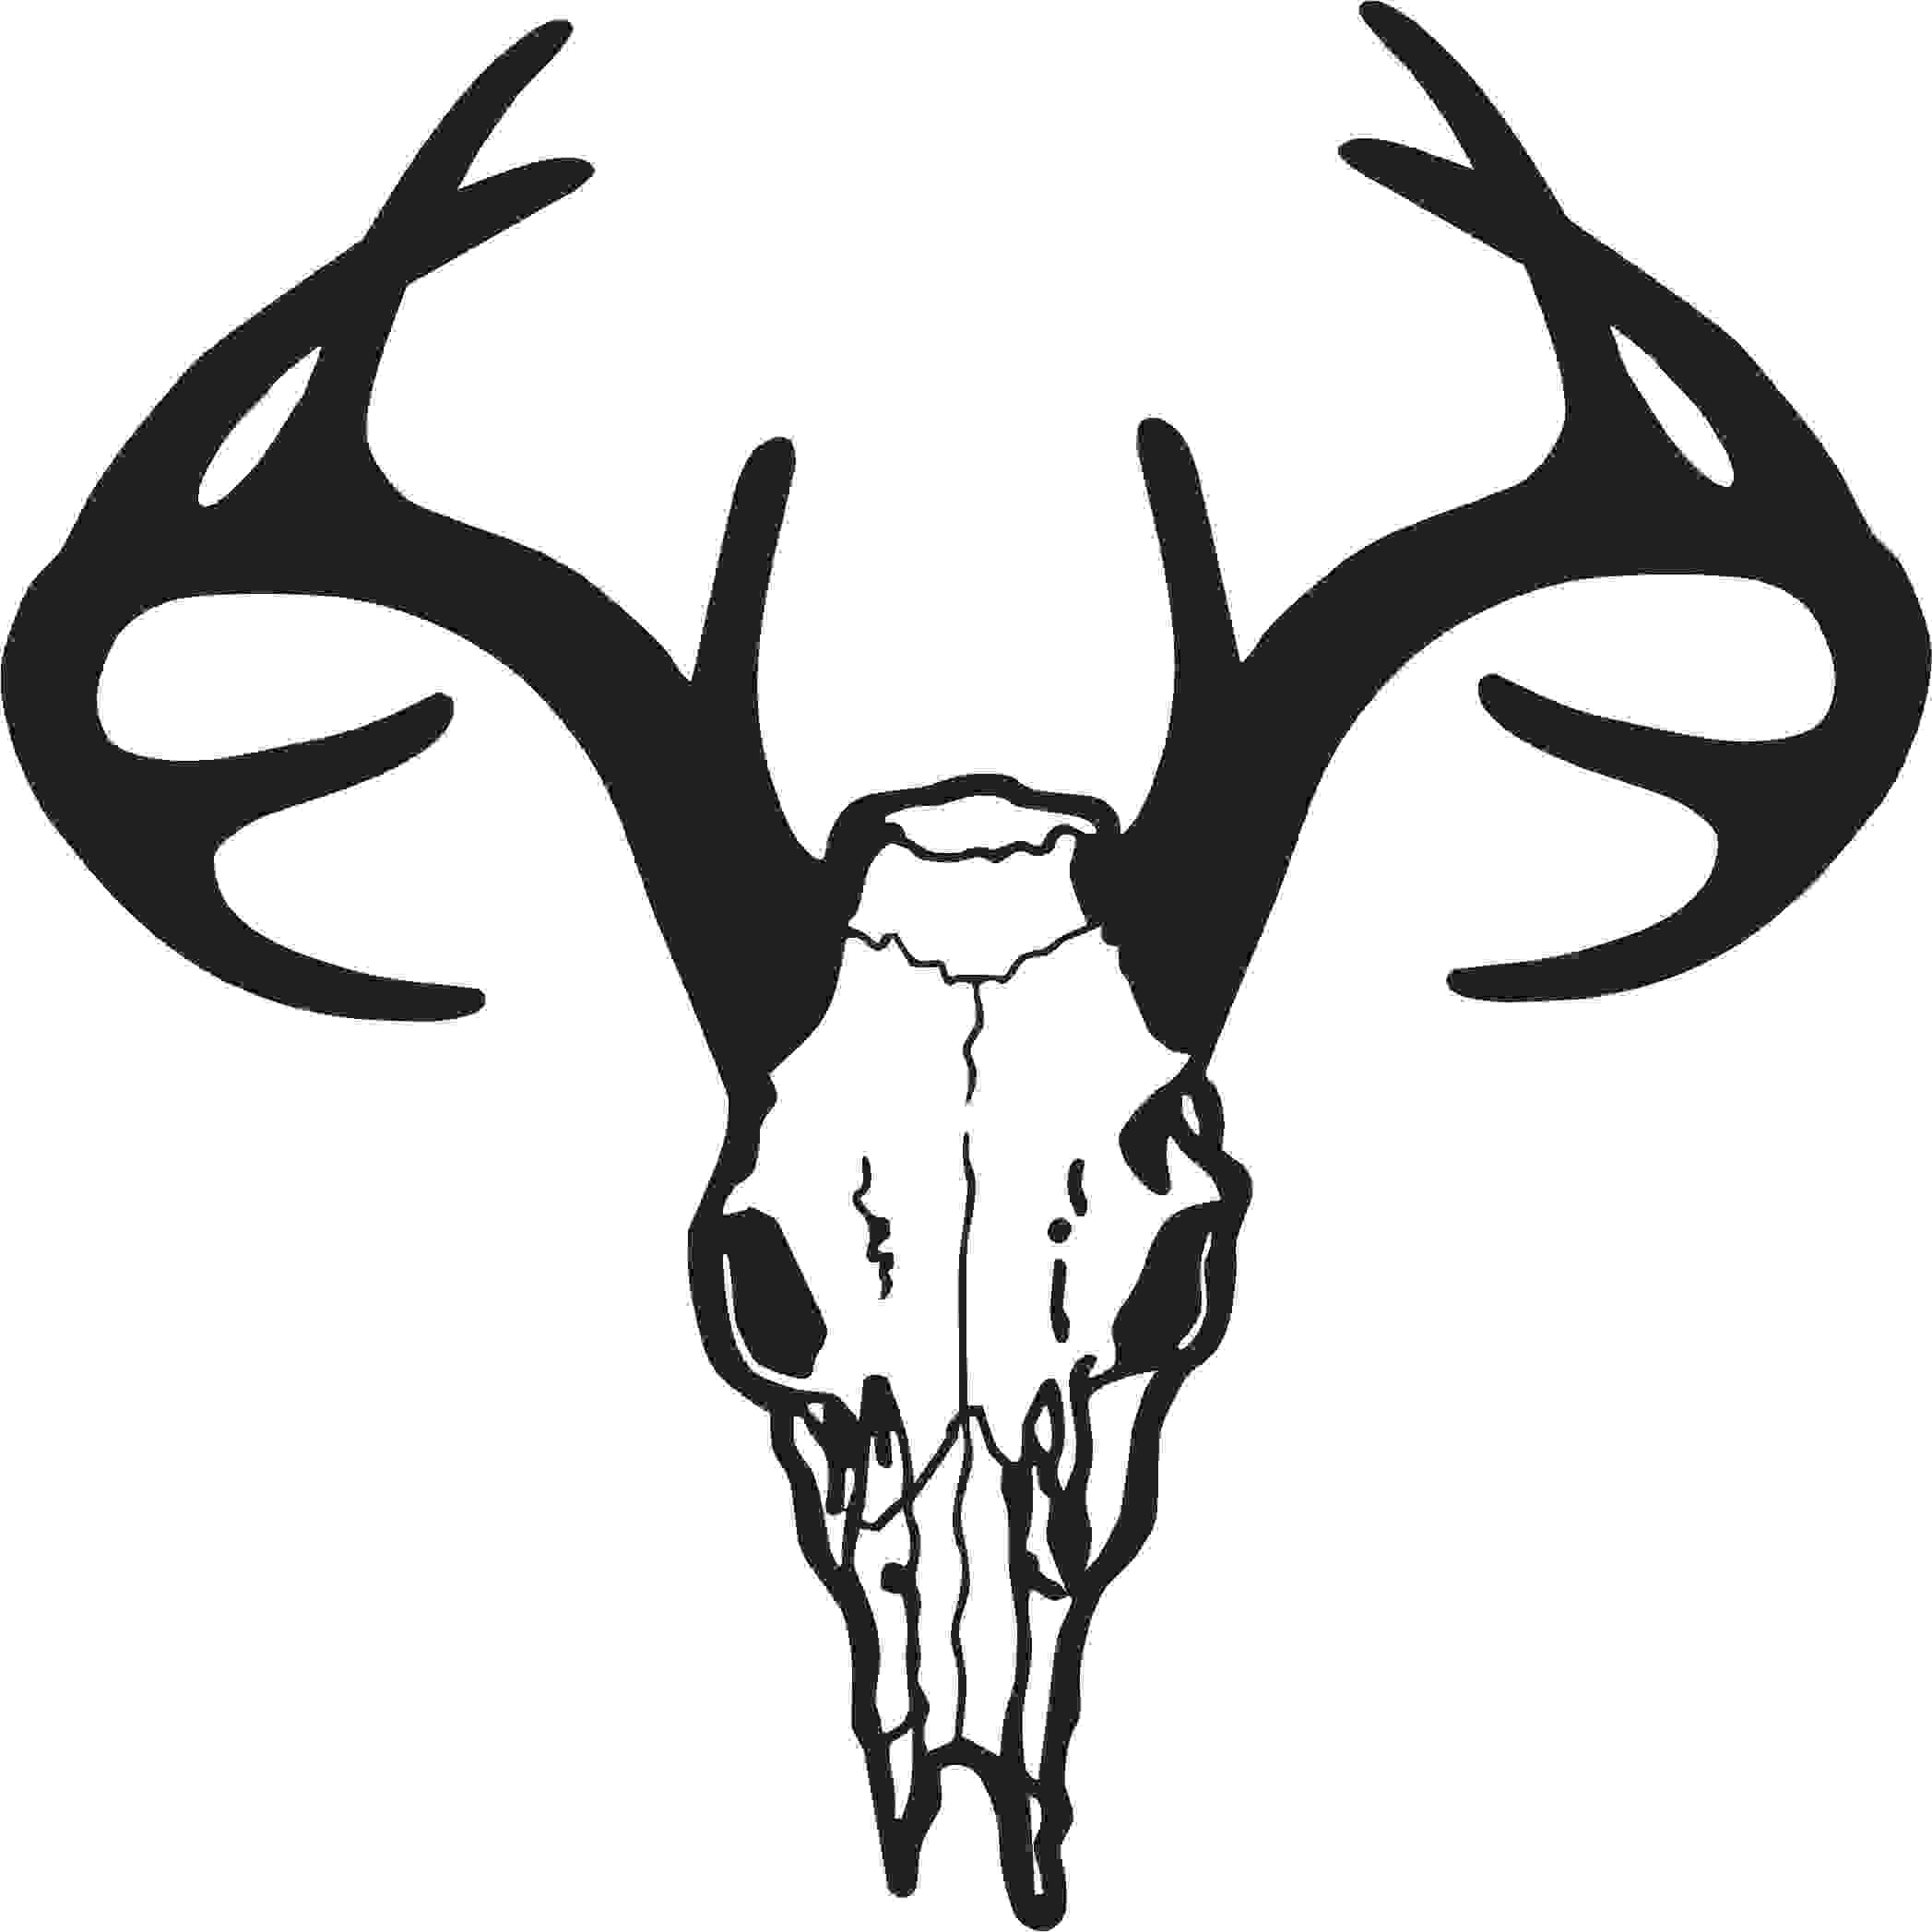 Antler clipart deer head Panda Images Skull Art Free